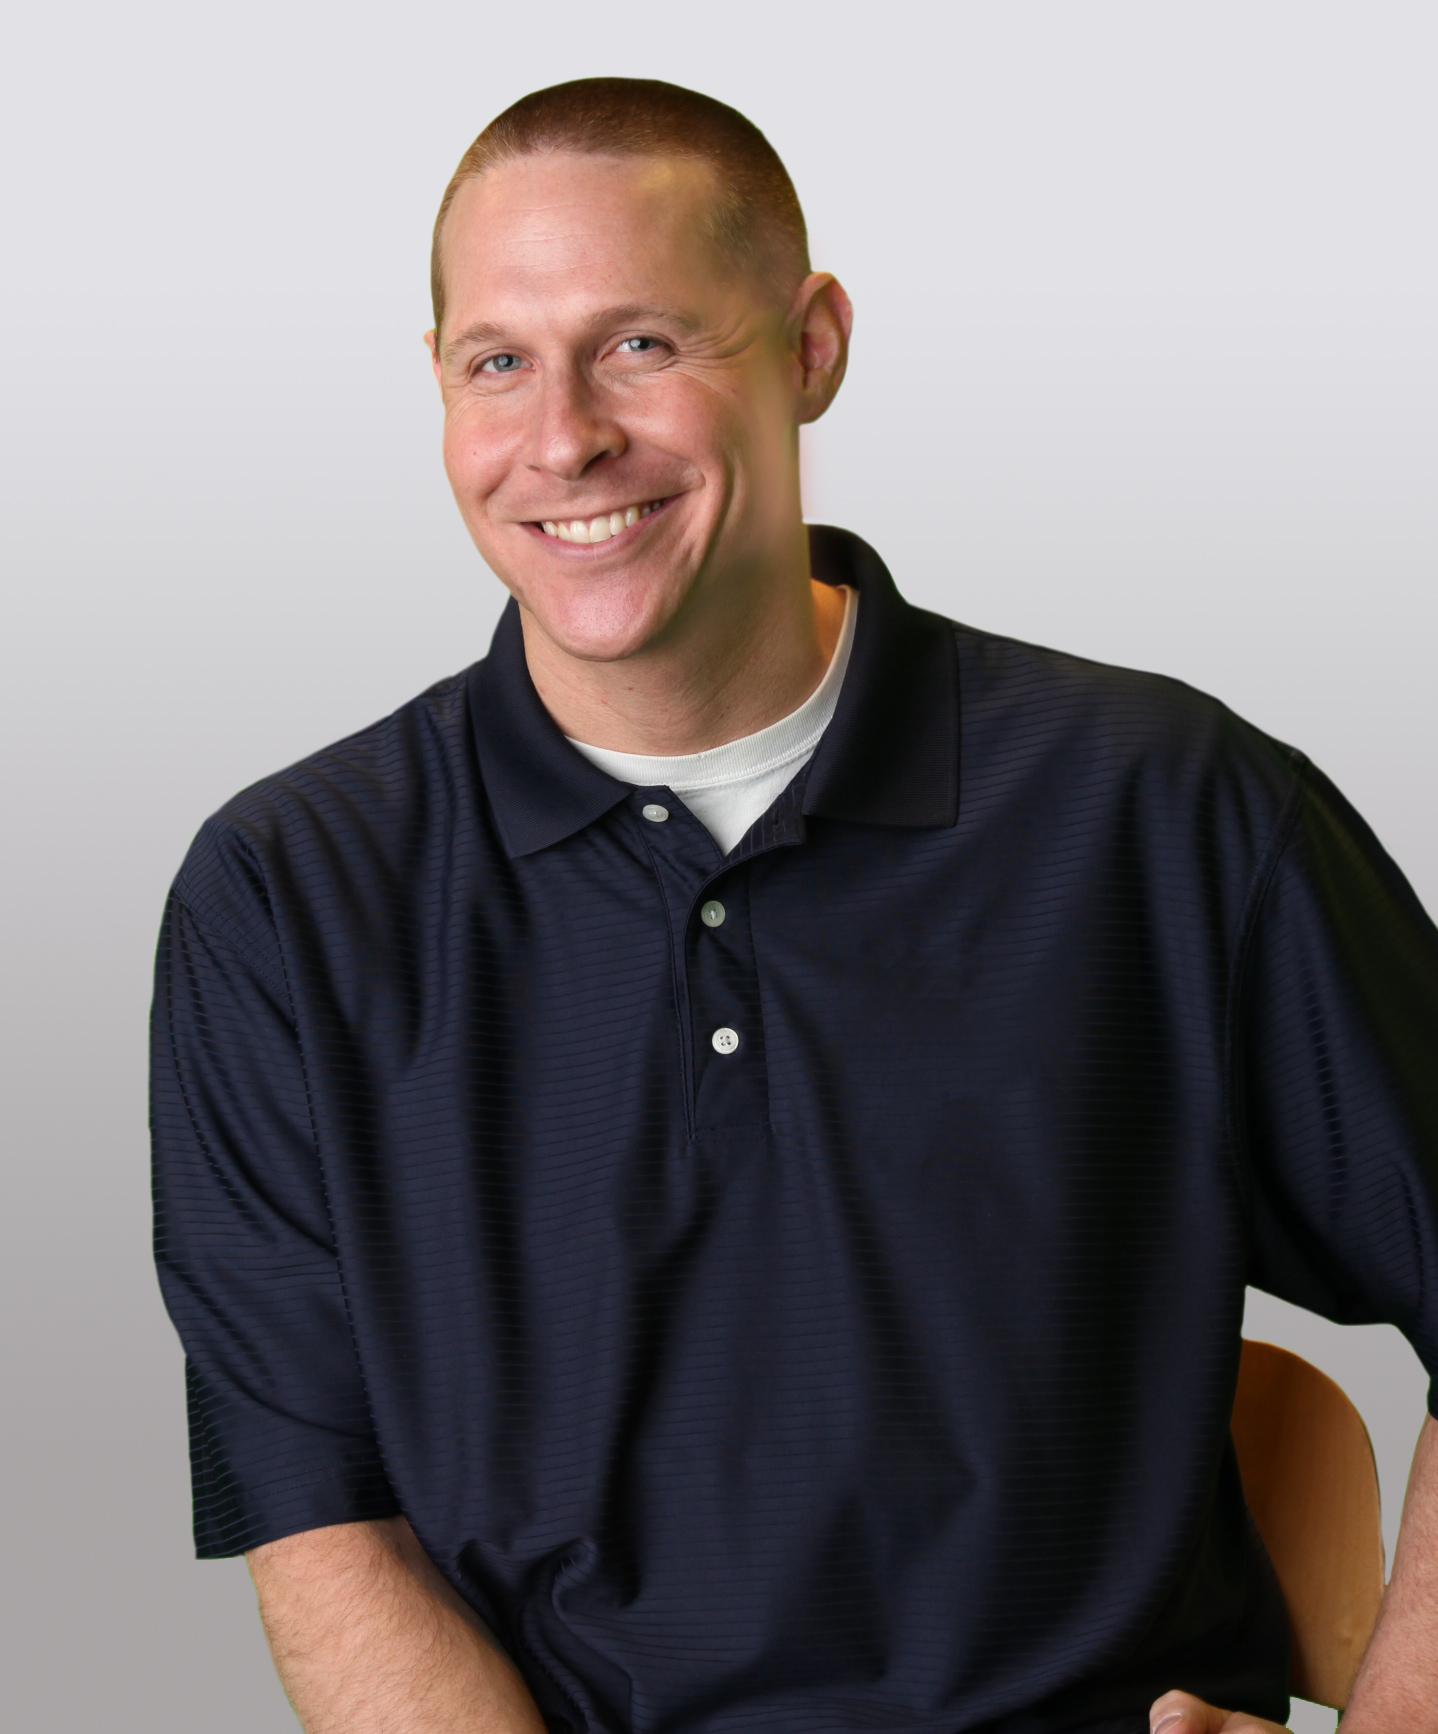 MATT CHERNOFF - NBC Sports PressboxNBC Sports Pressbox